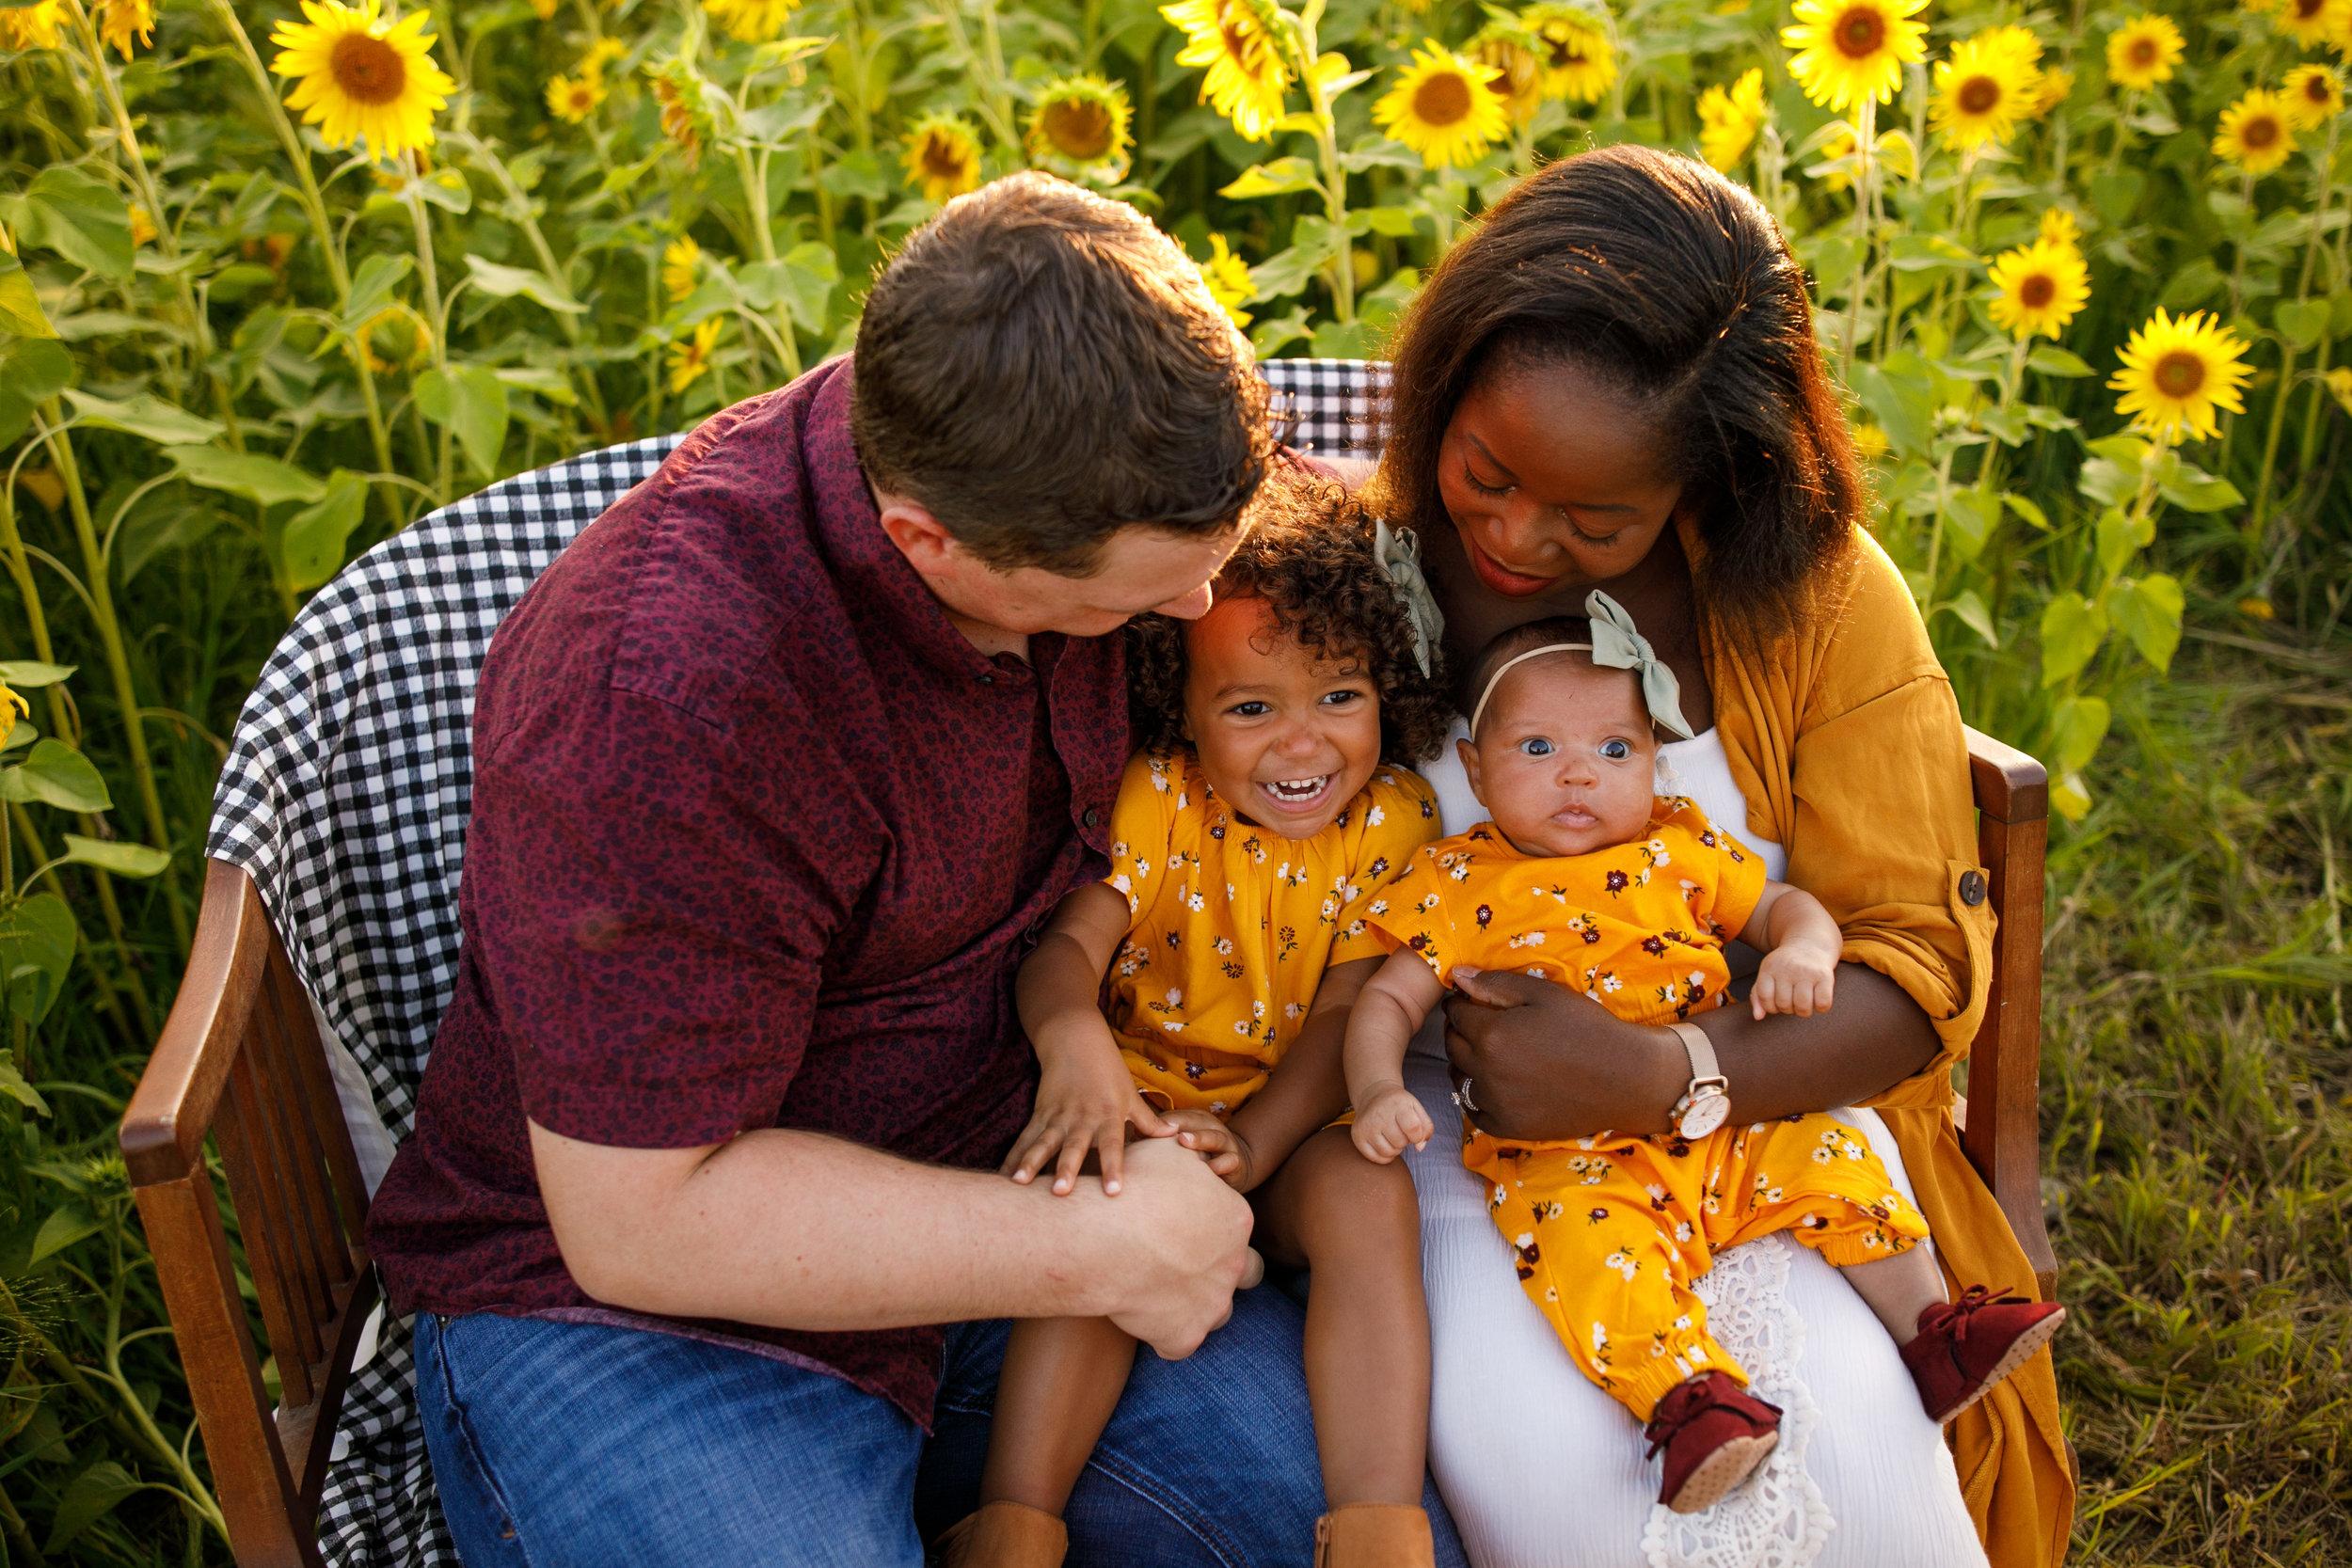 Morris Family Summer 2019 - Grand Rapids Photographer - Grand Rapids Family Photographer - Ed Dunneback and Girls - J Darling Photo 032.jpg